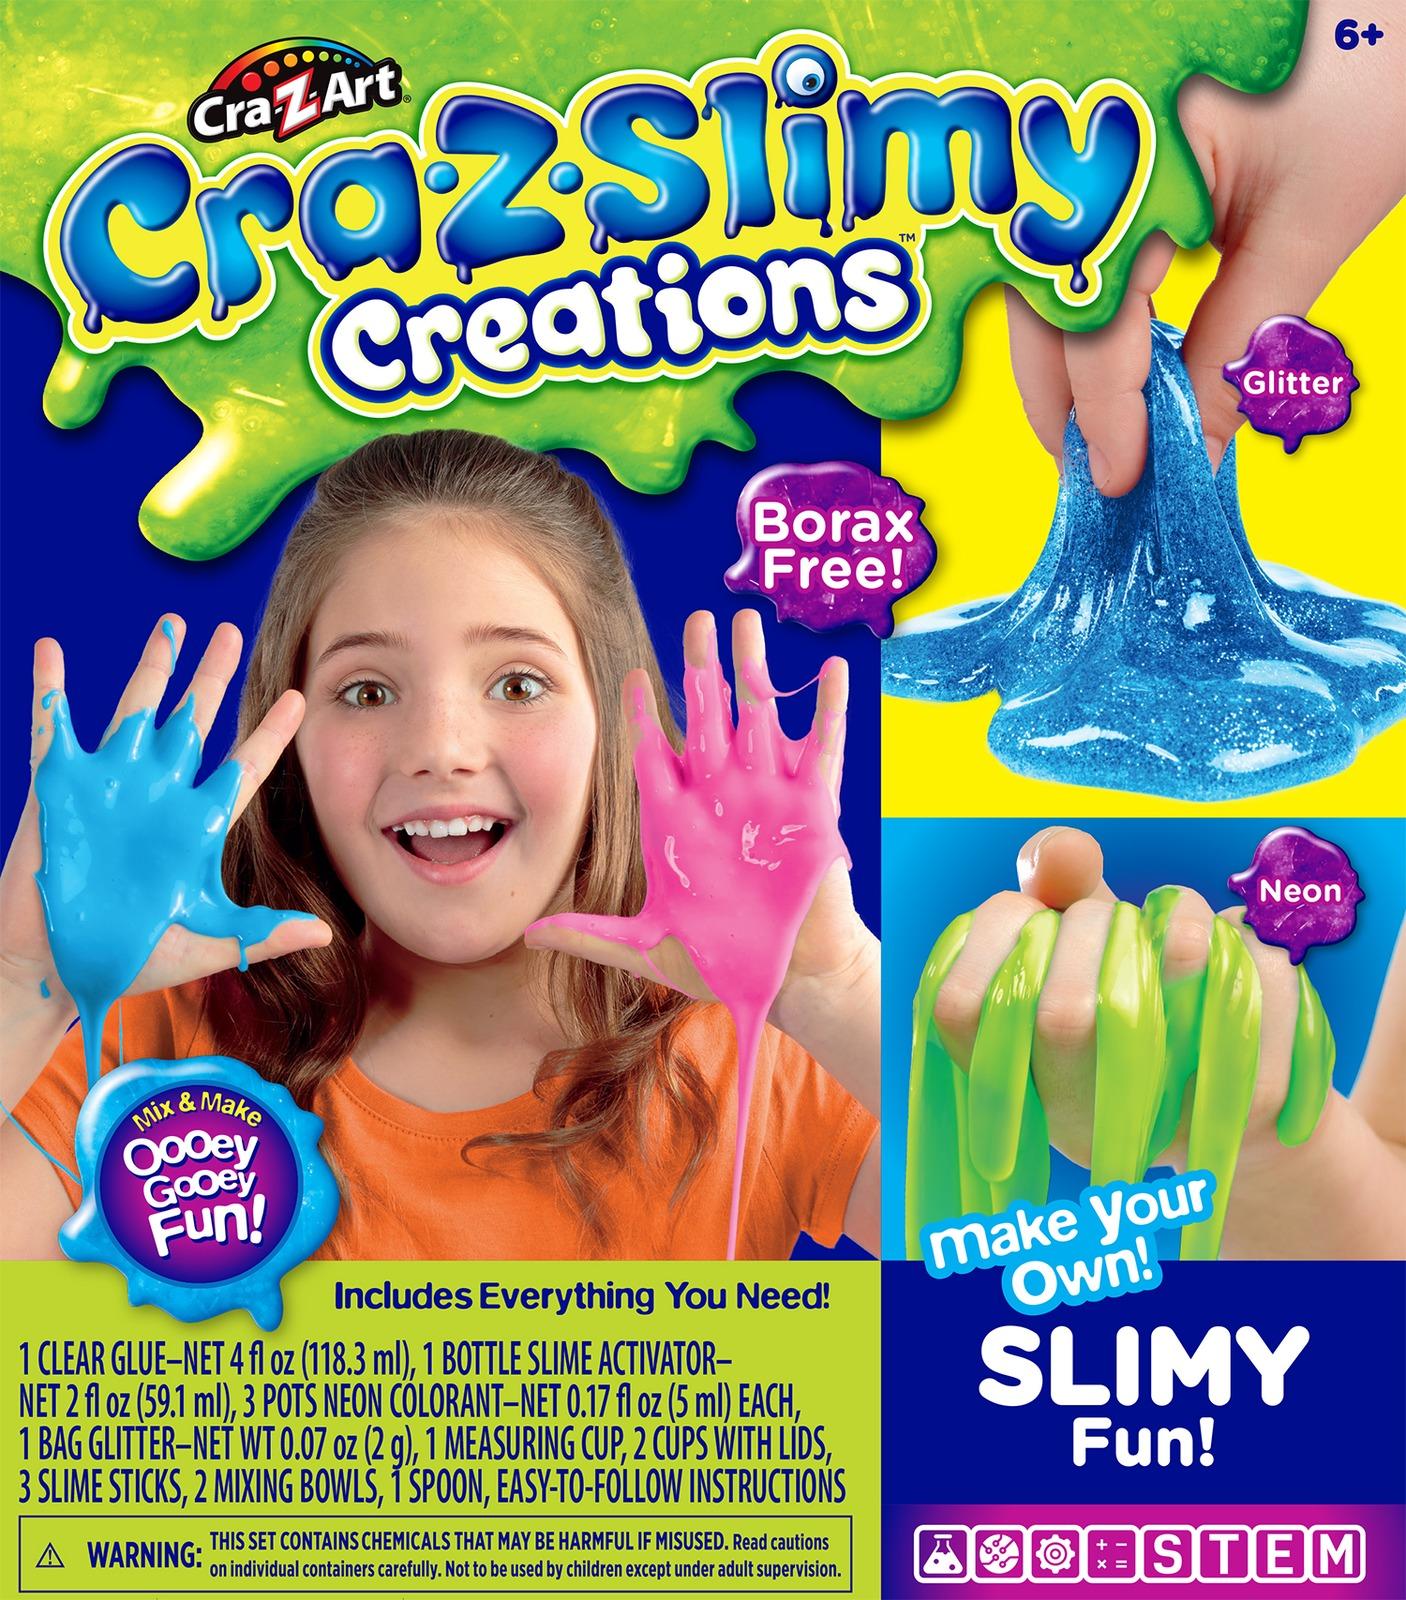 Cra-z-slimy Creations: Slime Making Kit - Glitter image